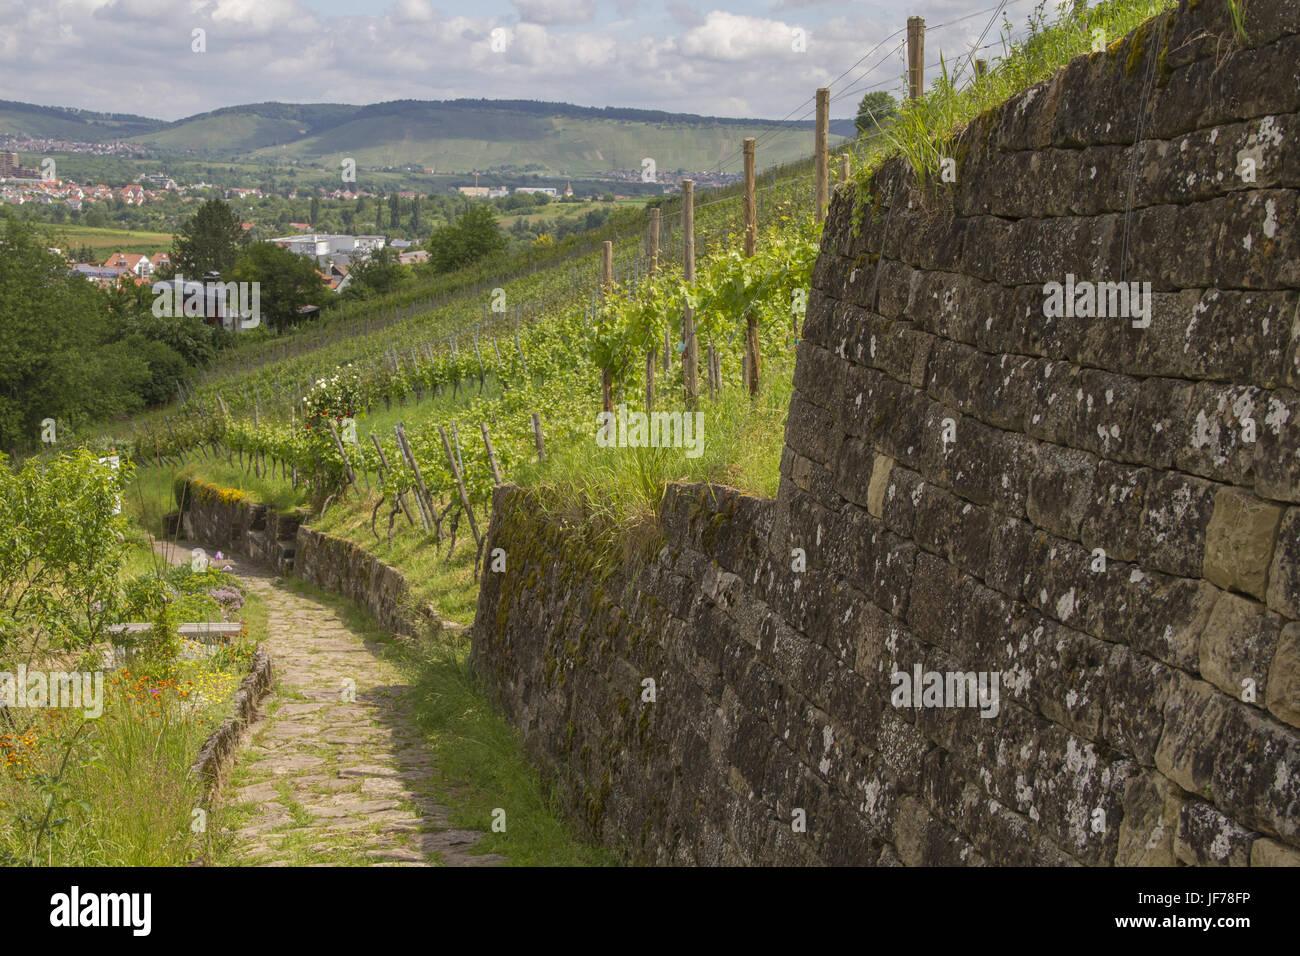 Vineyards in Kernen, Rems Valley, Deutschland - Stock Image